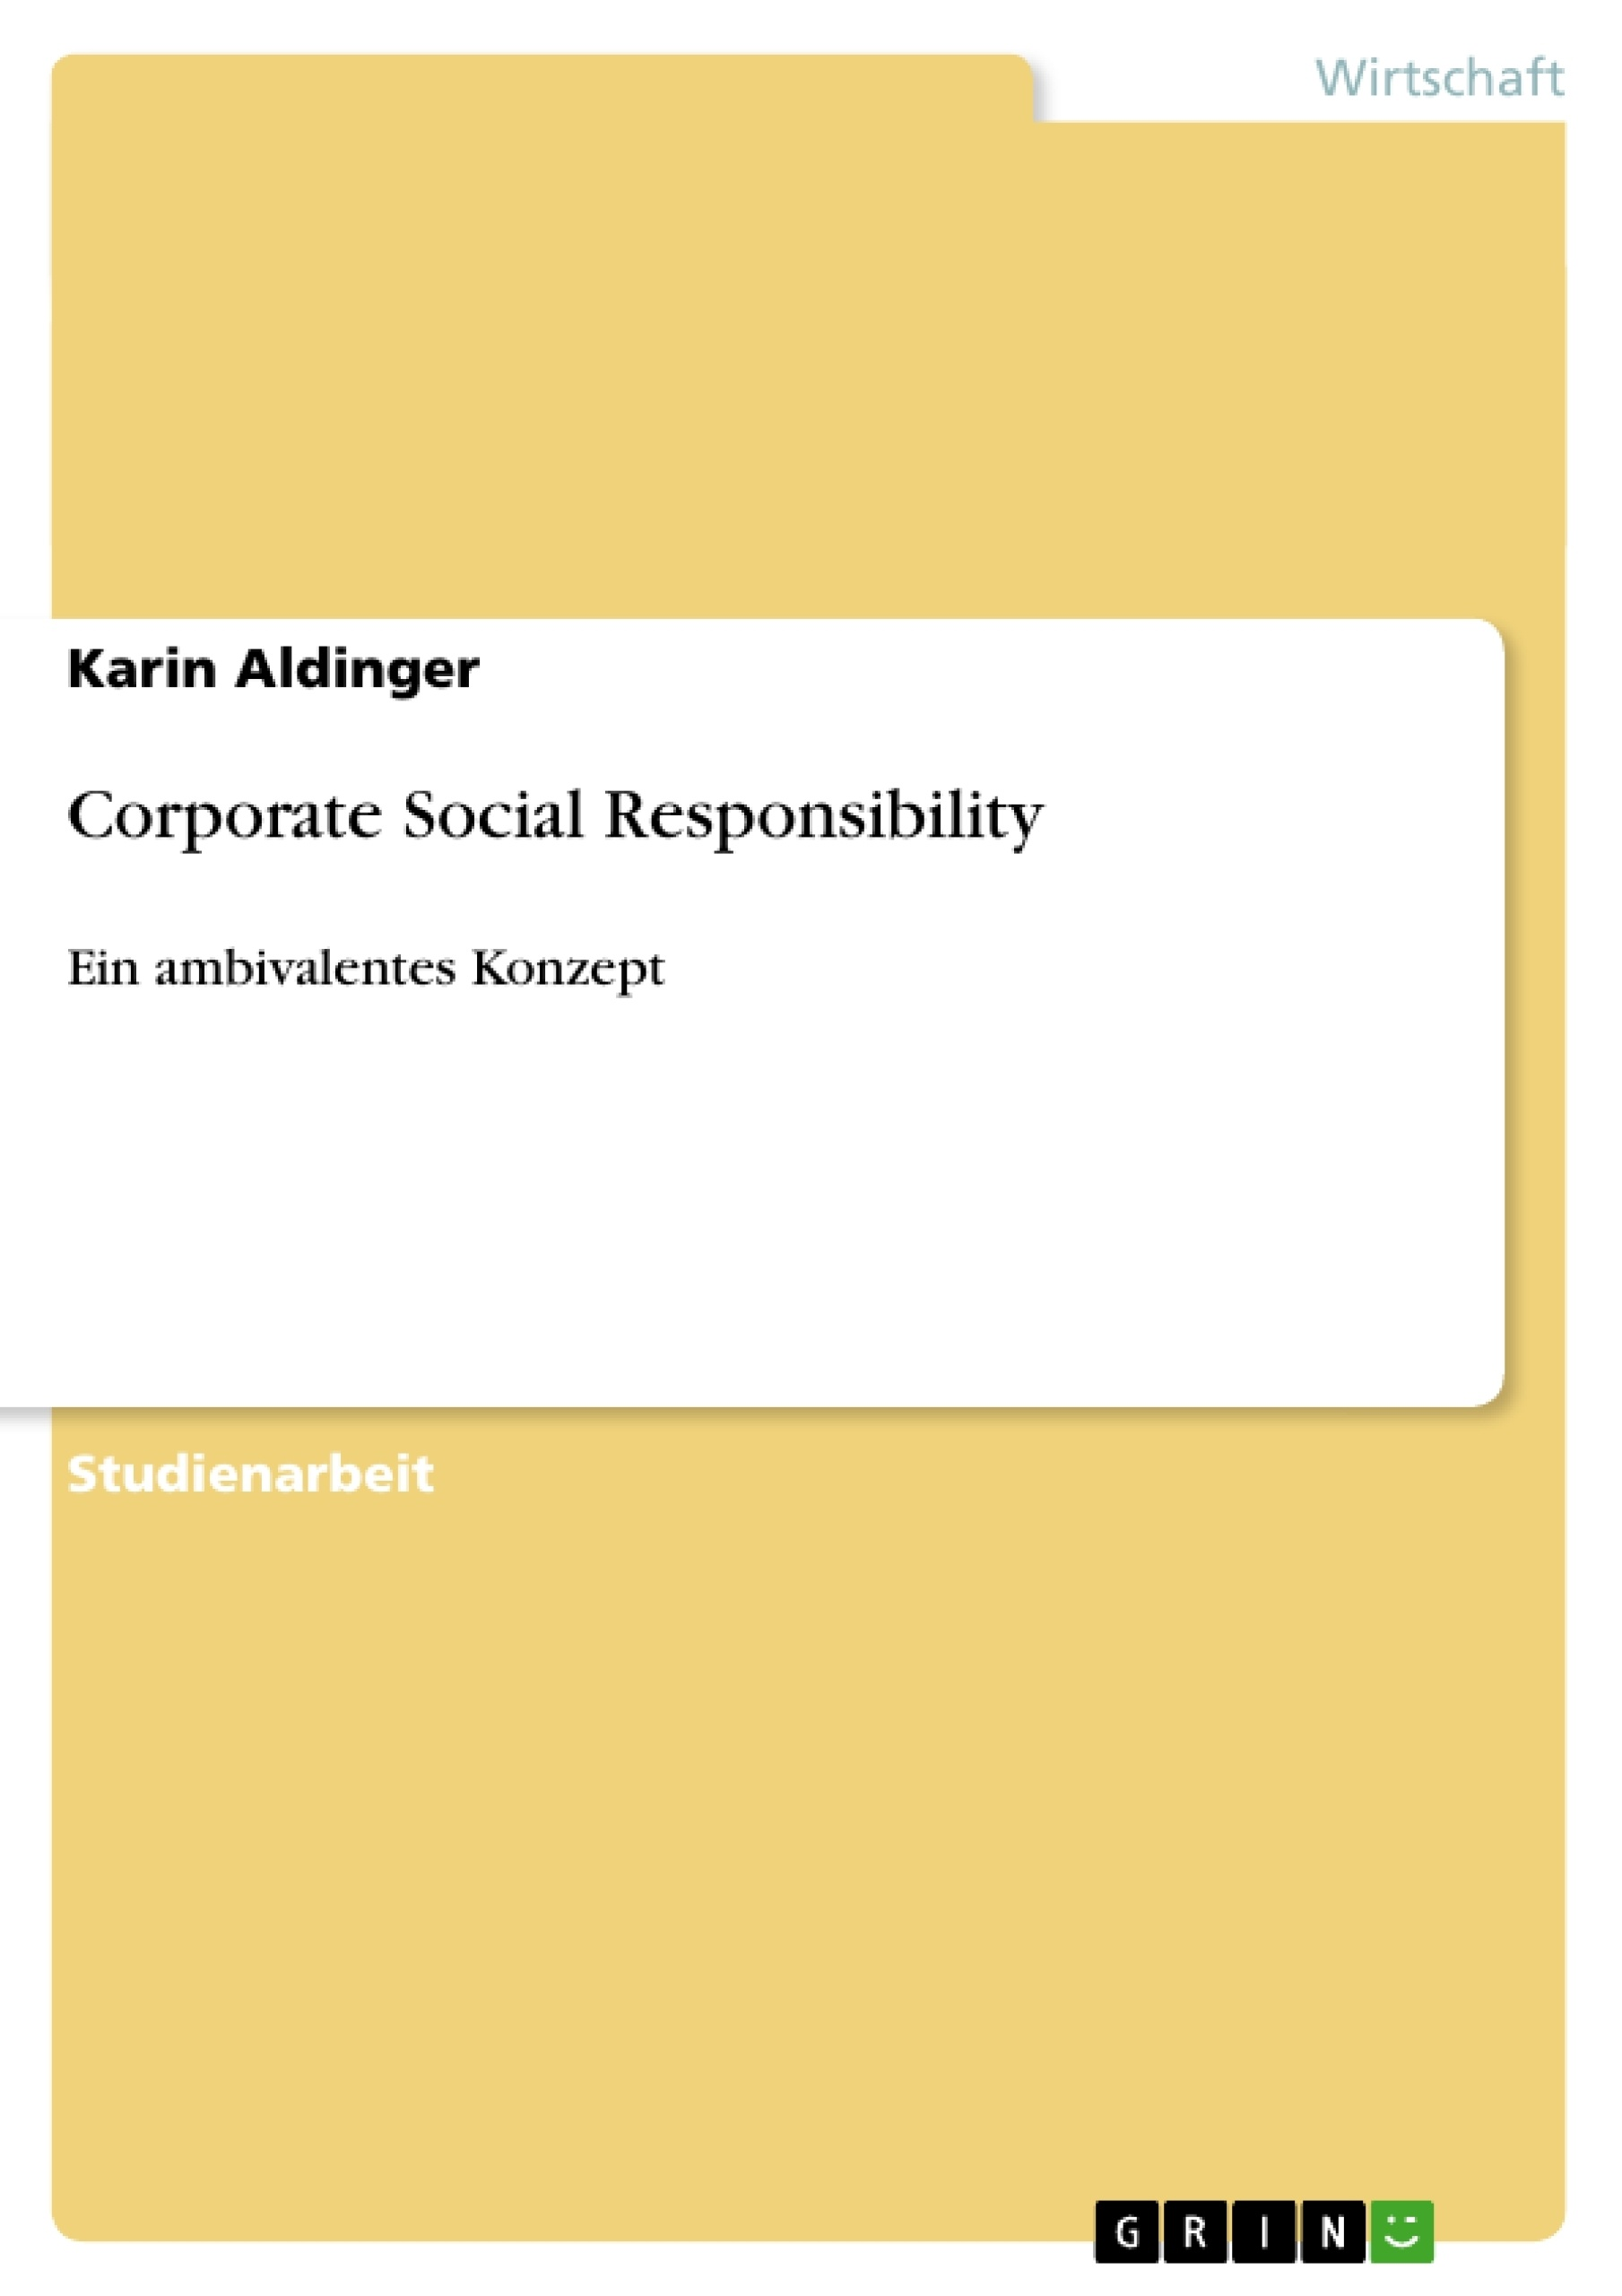 Titel: Corporate Social Responsibility